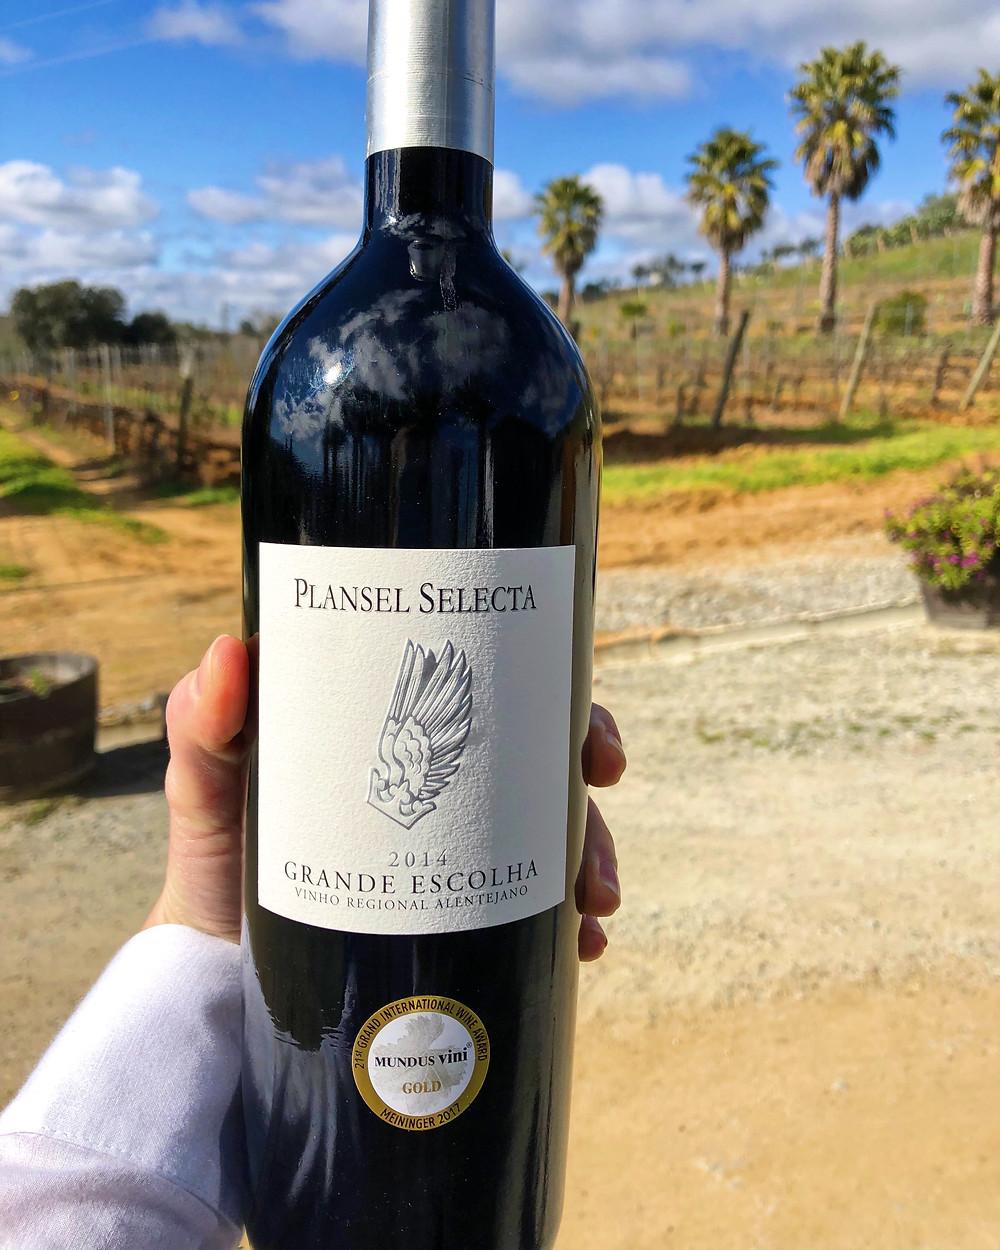 wine bottle of Plansel Grande Escolha 2014 Alentejo regional wine during Quinta da Plansel winery tour